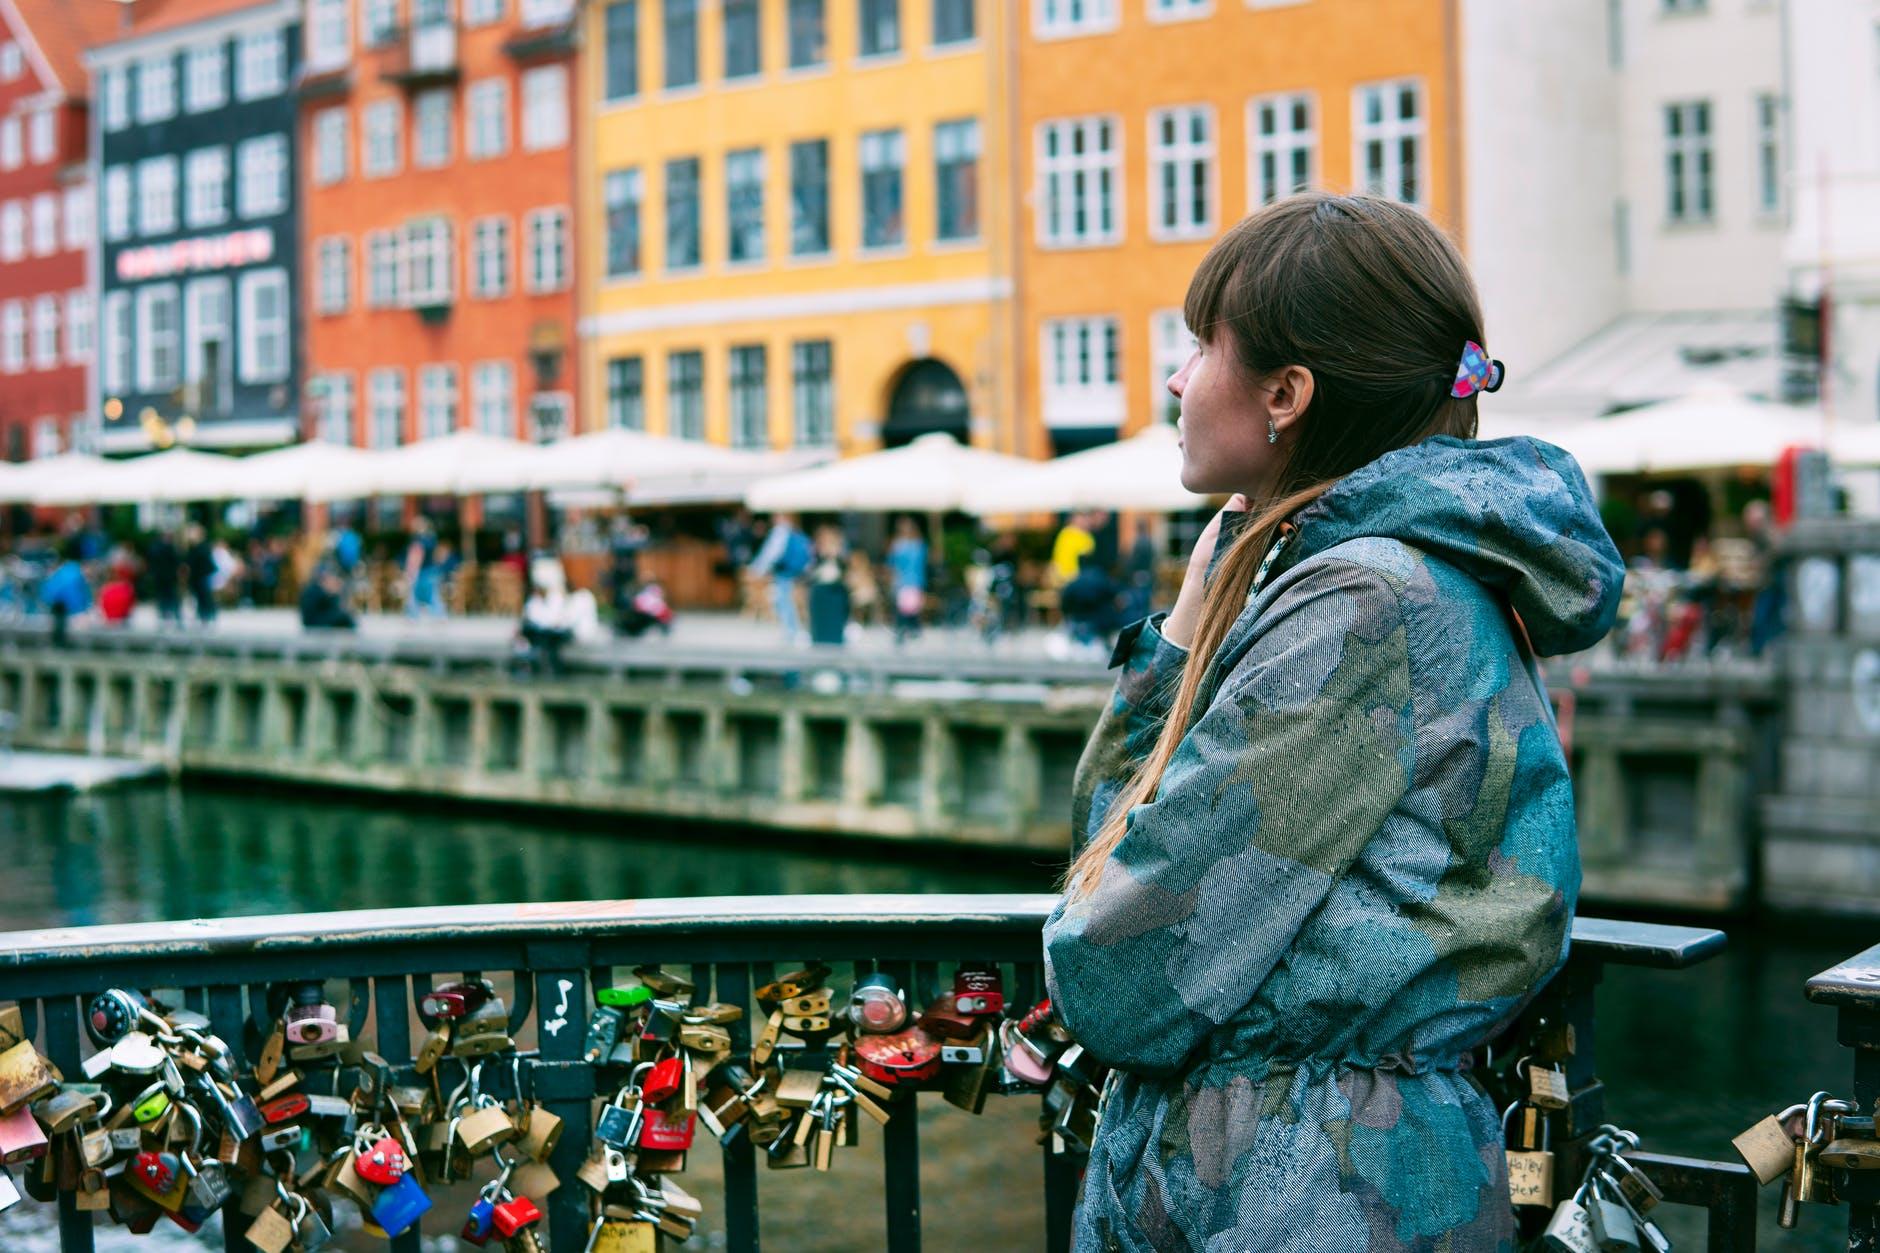 Stedentrip Kopenhagen duurzaam